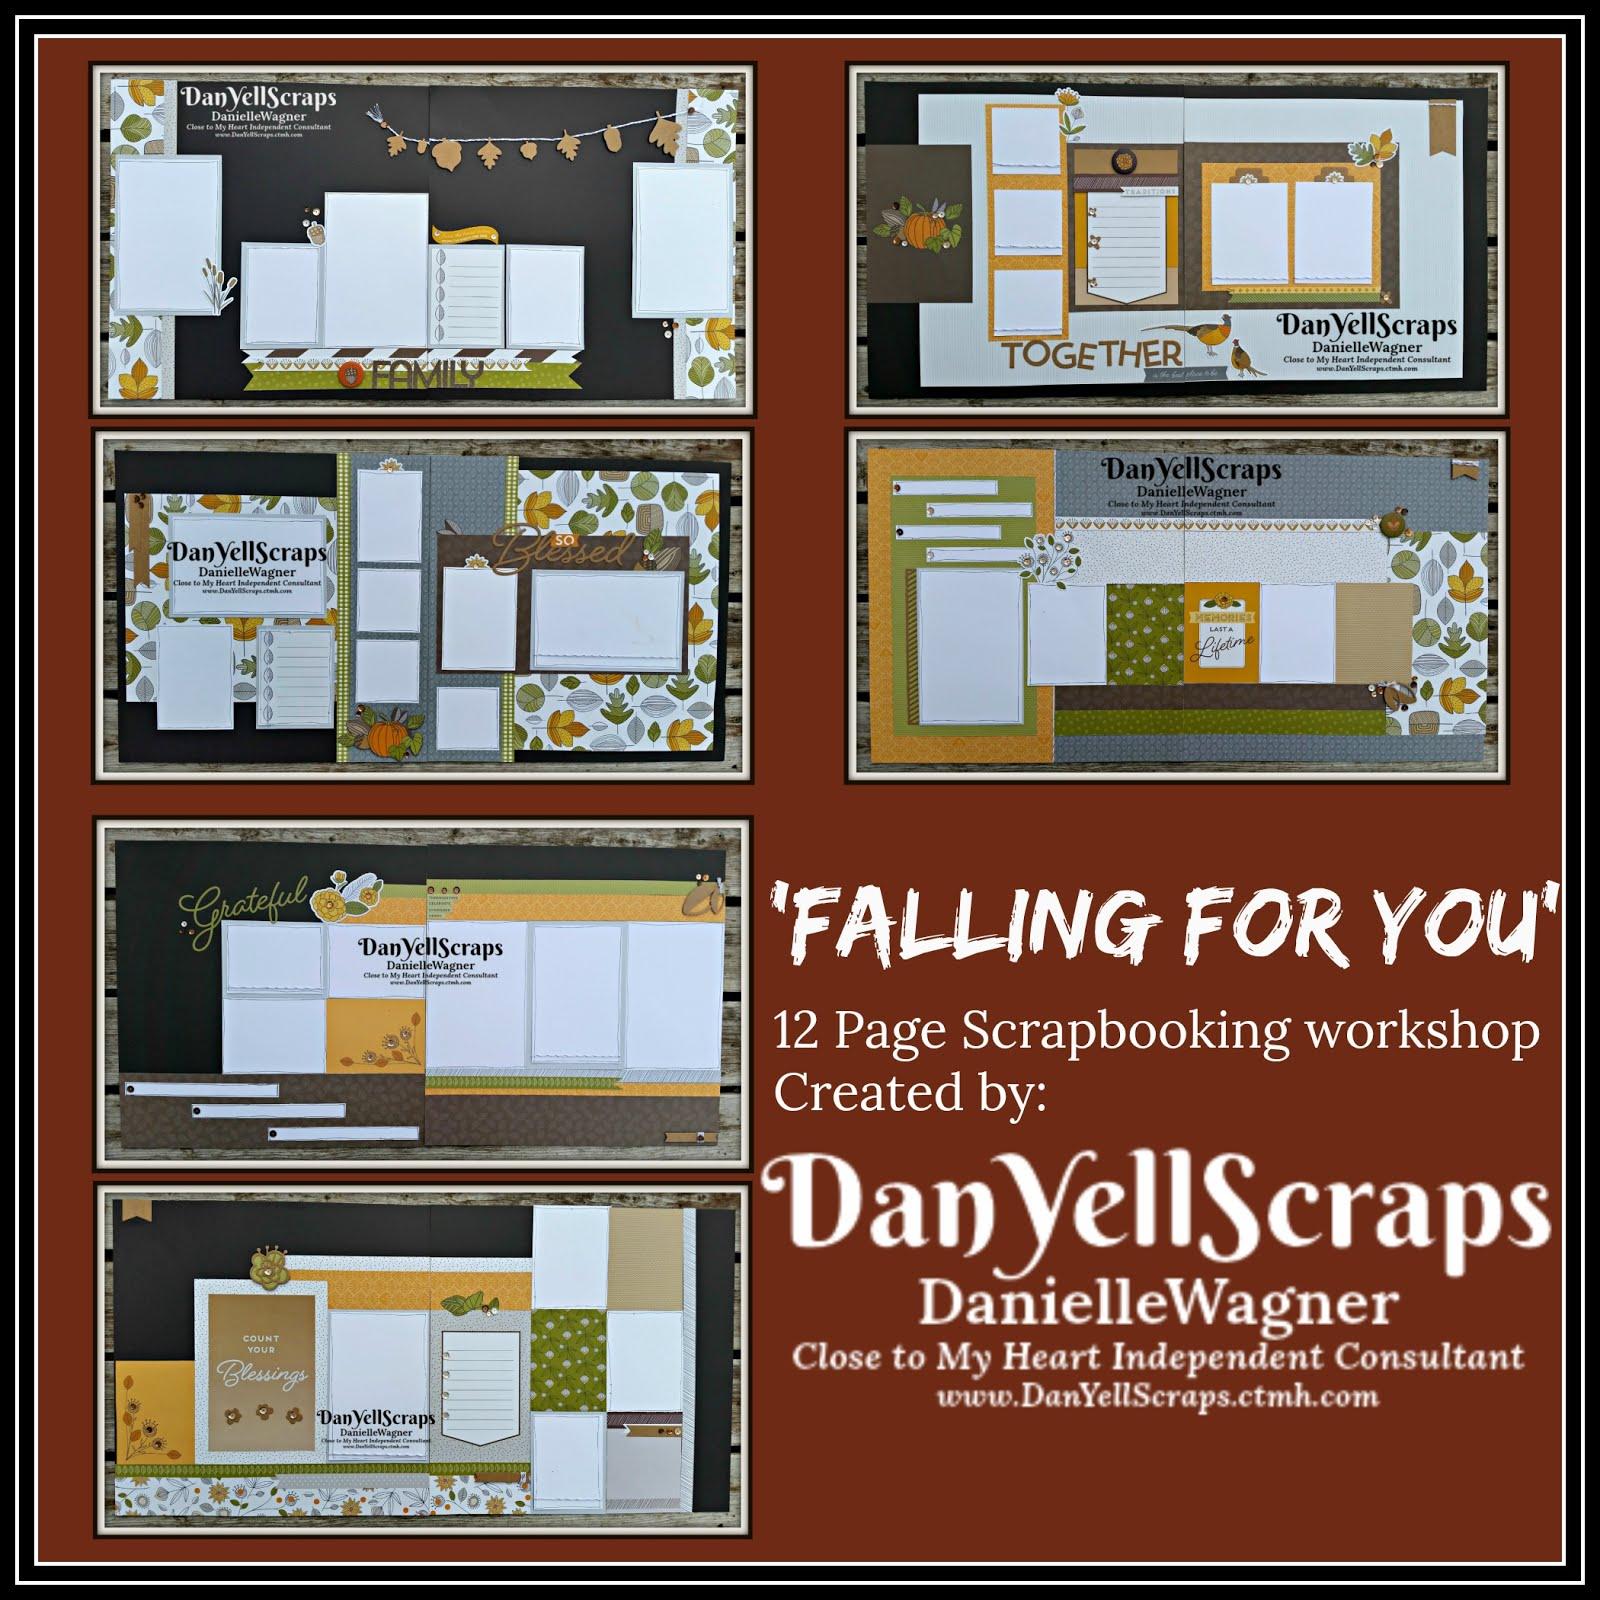 Falling For You Scrapbooking Workshop